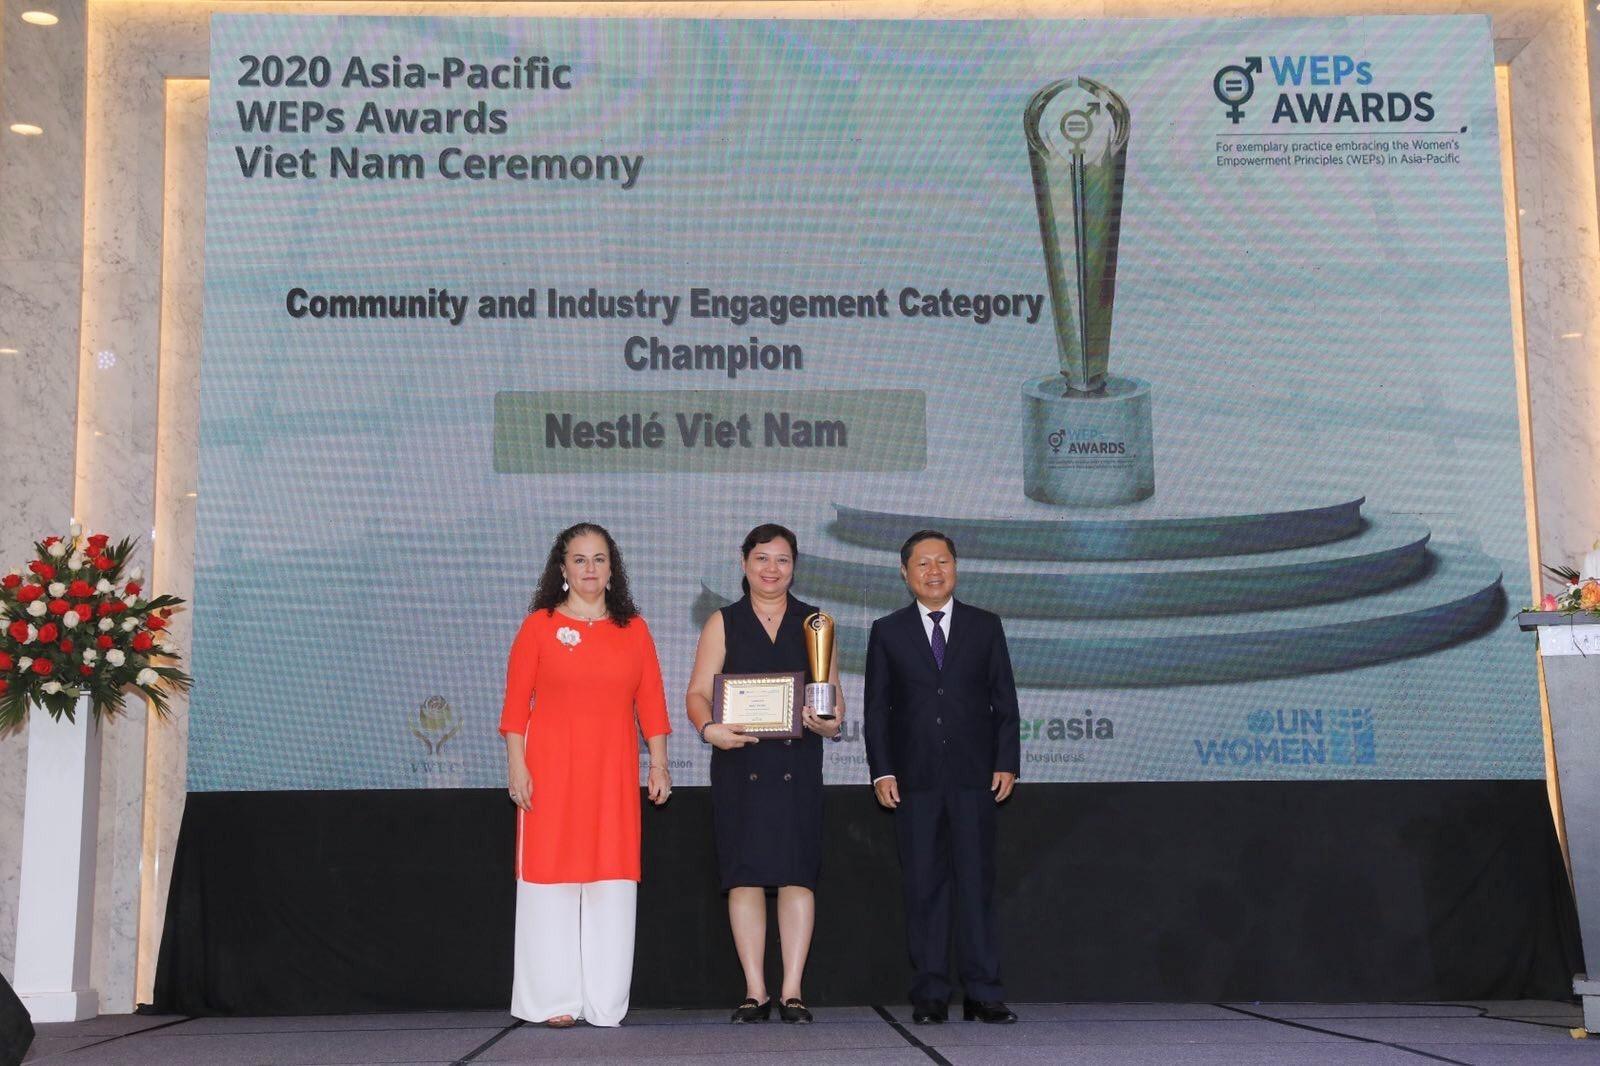 Nestlé Vietnam receives two UN Women awards for advancing gender equality